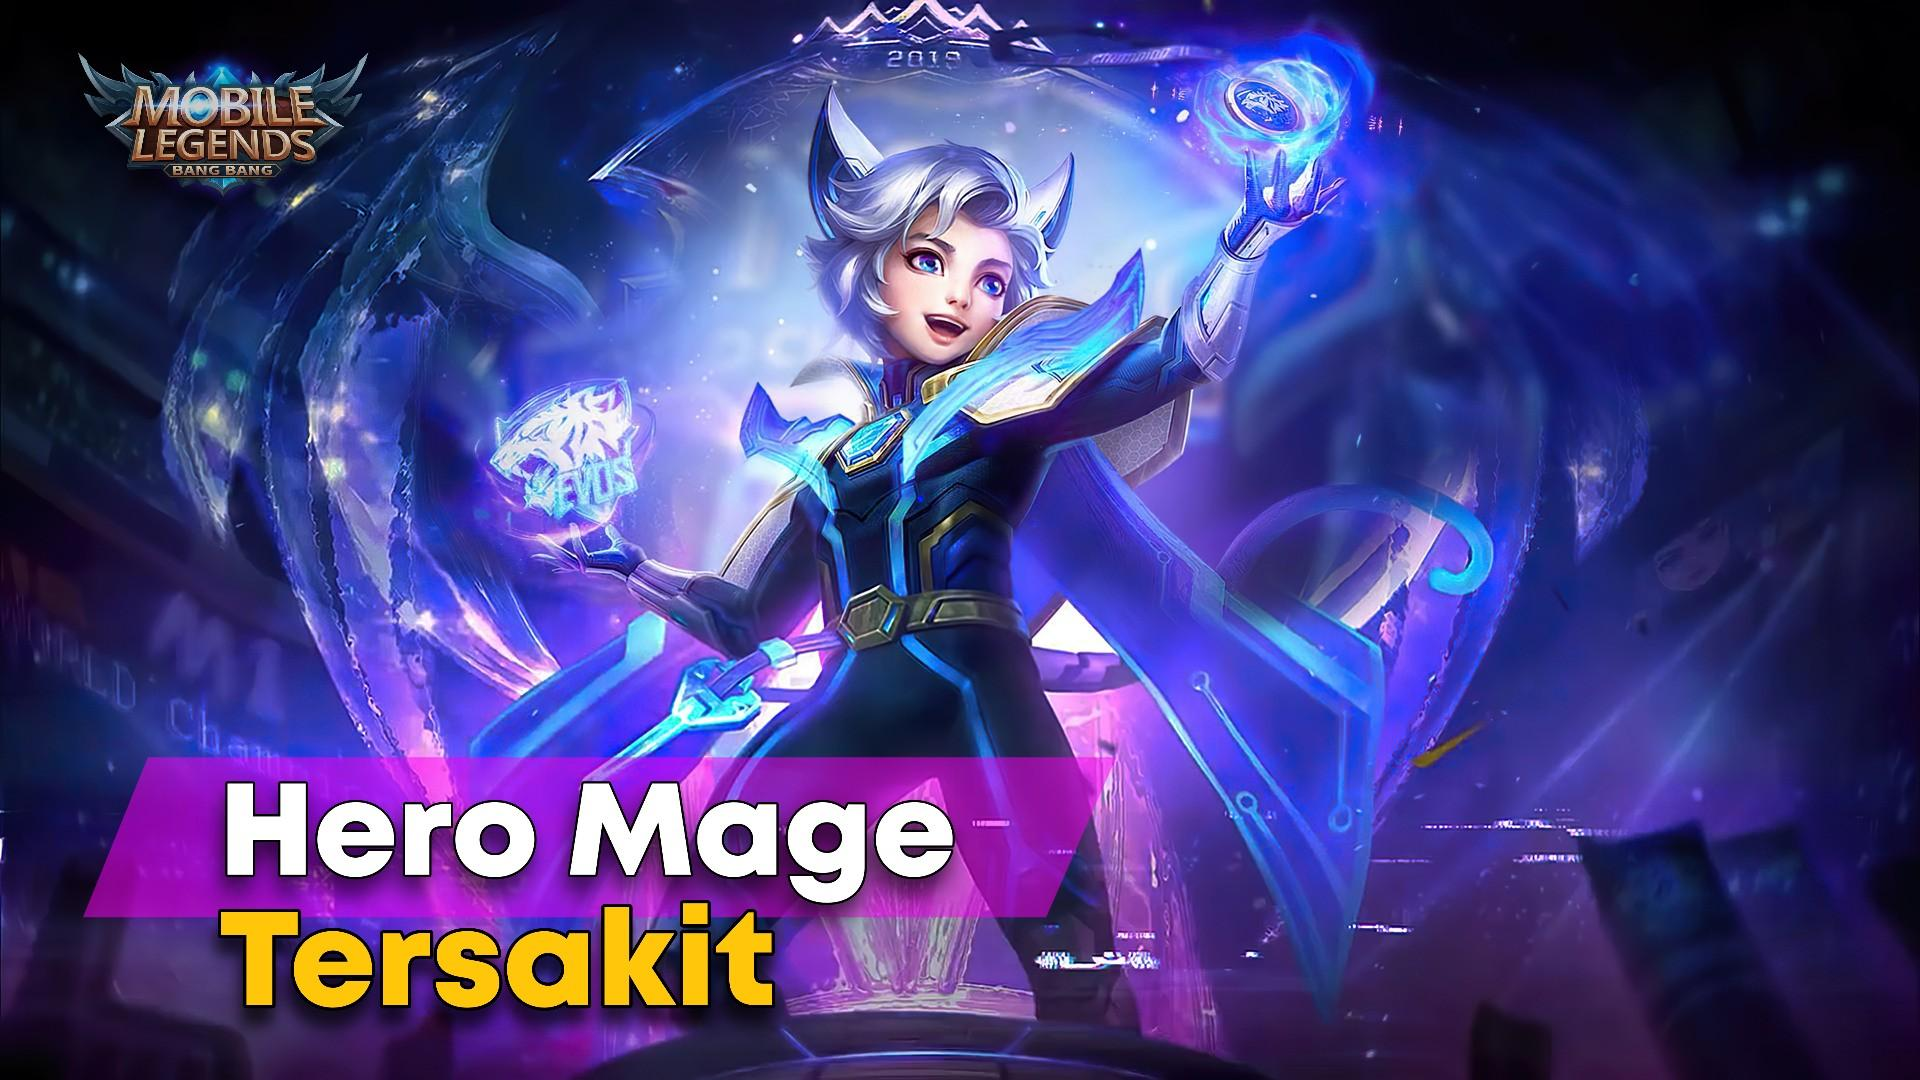 Hero Mage Tersakit Mobile Legends